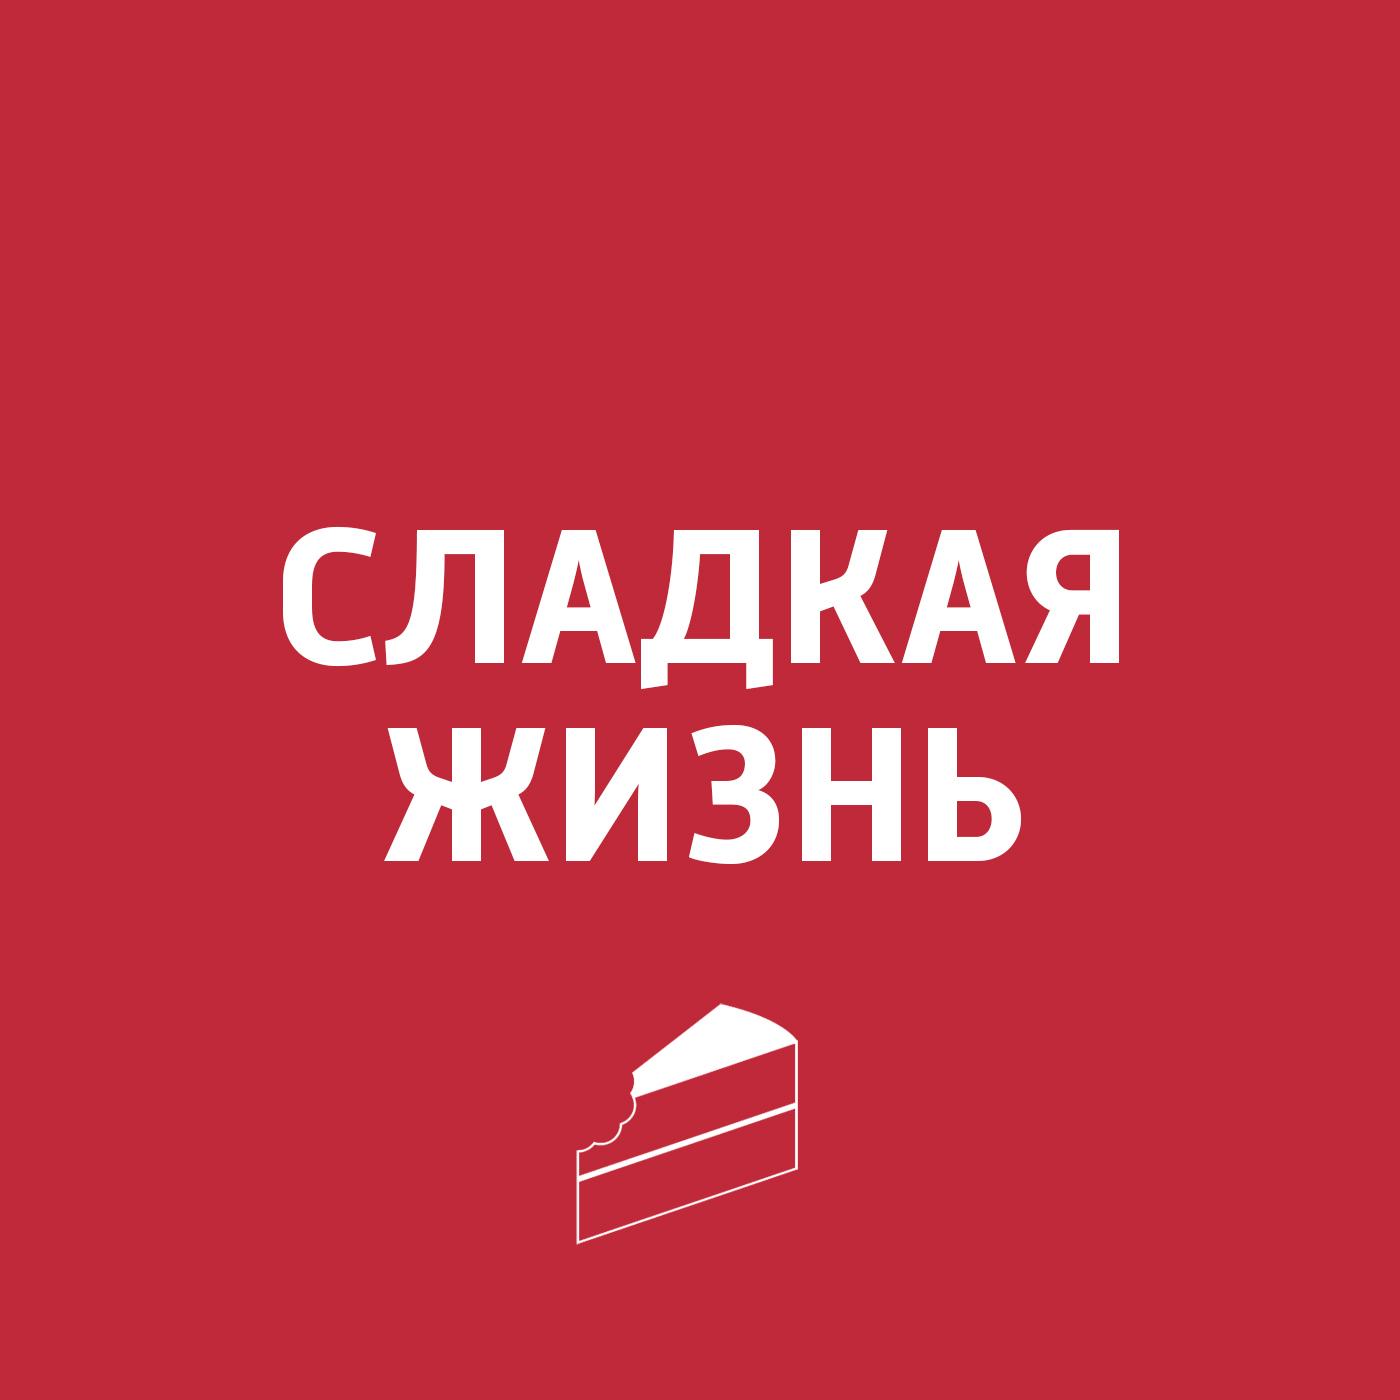 Картаев Павел Бискотти бискотти фитнес печенье 80 г